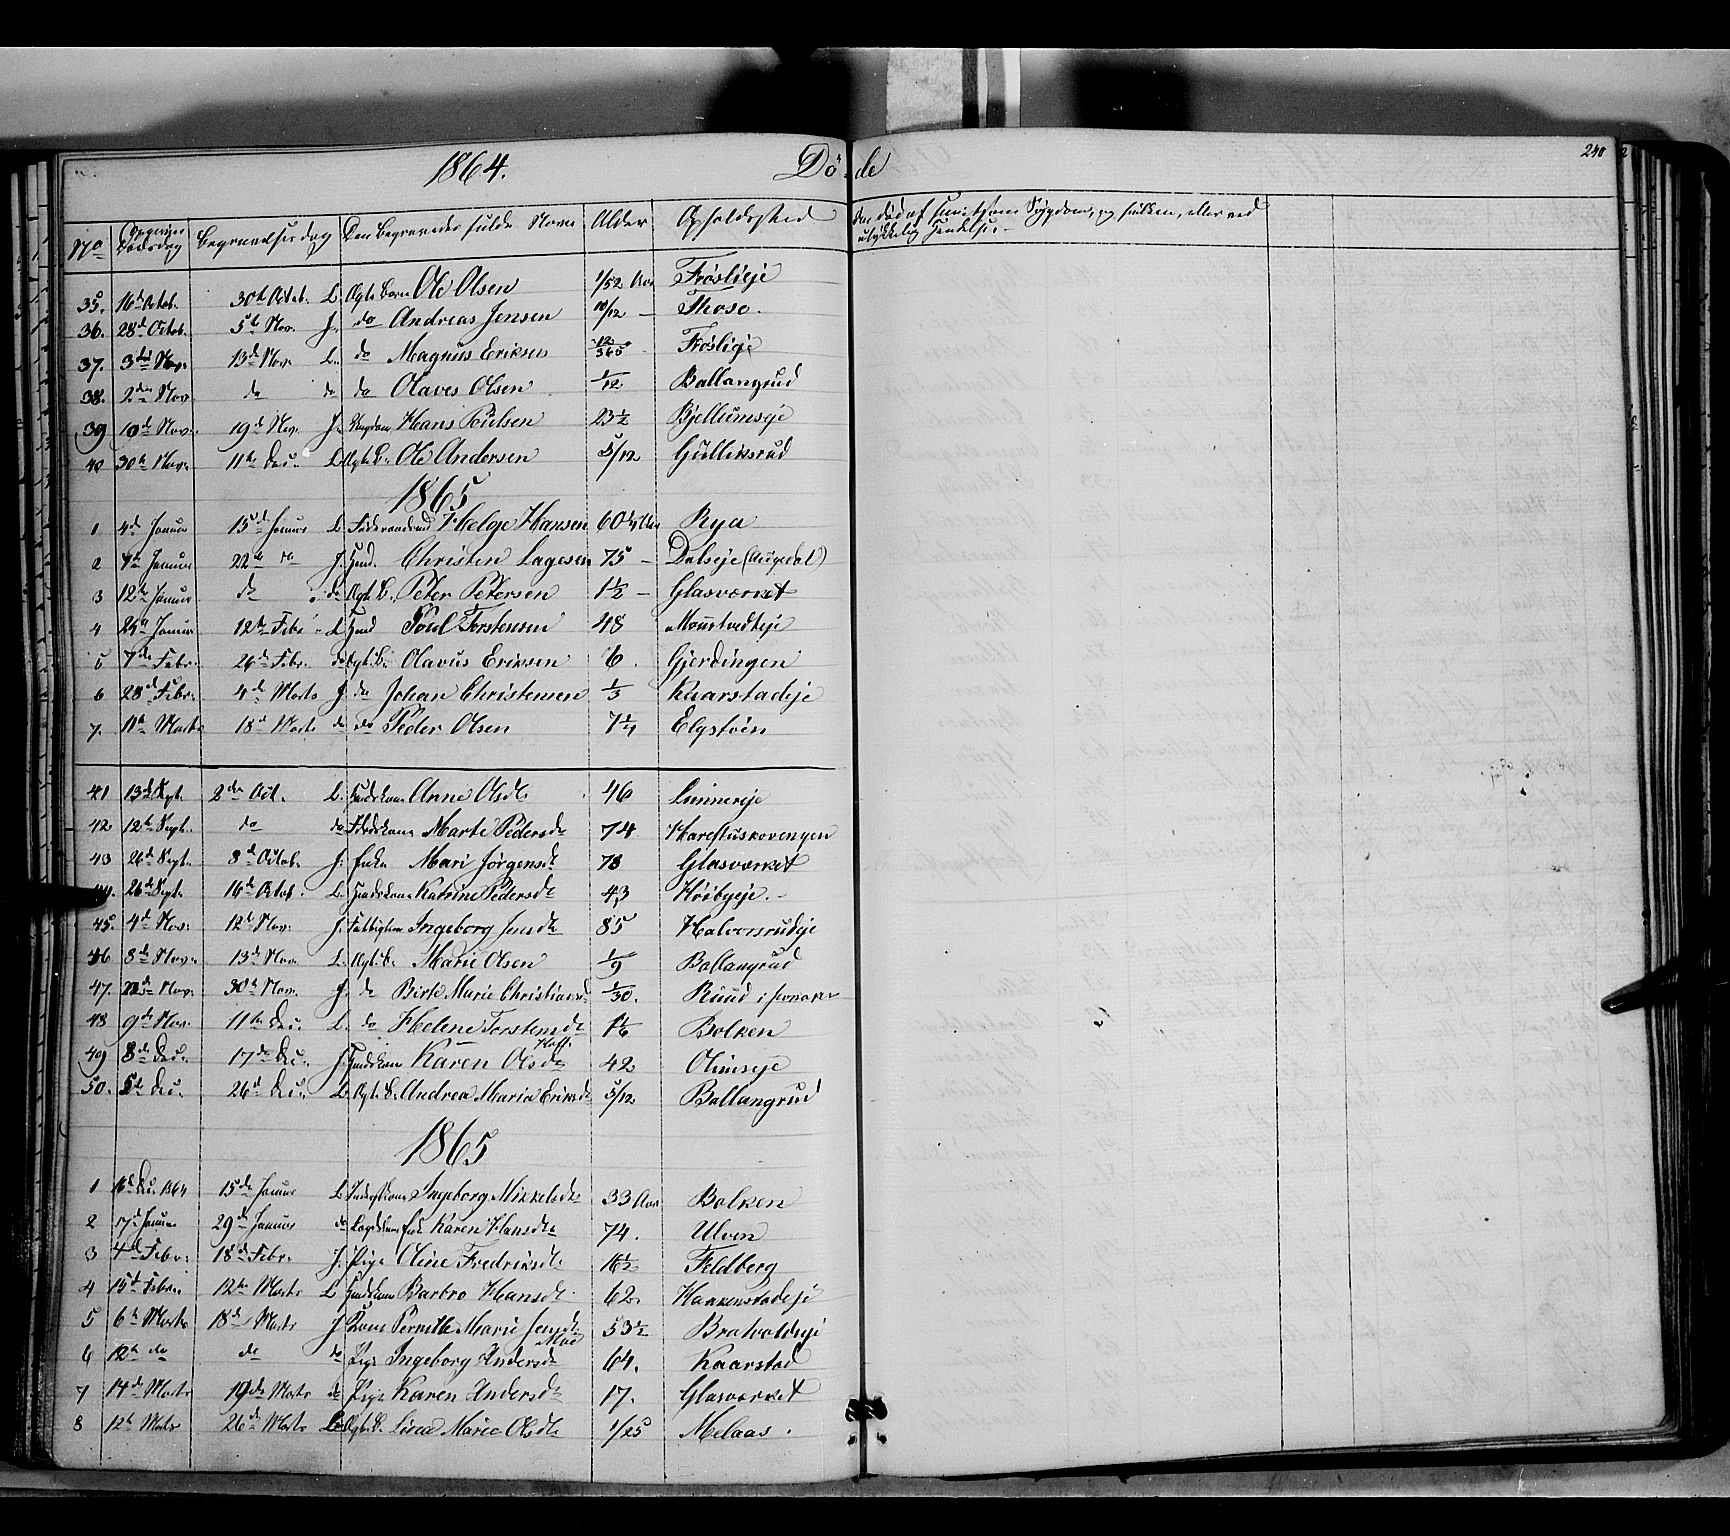 SAH, Jevnaker prestekontor, Ministerialbok nr. 7, 1858-1876, s. 240